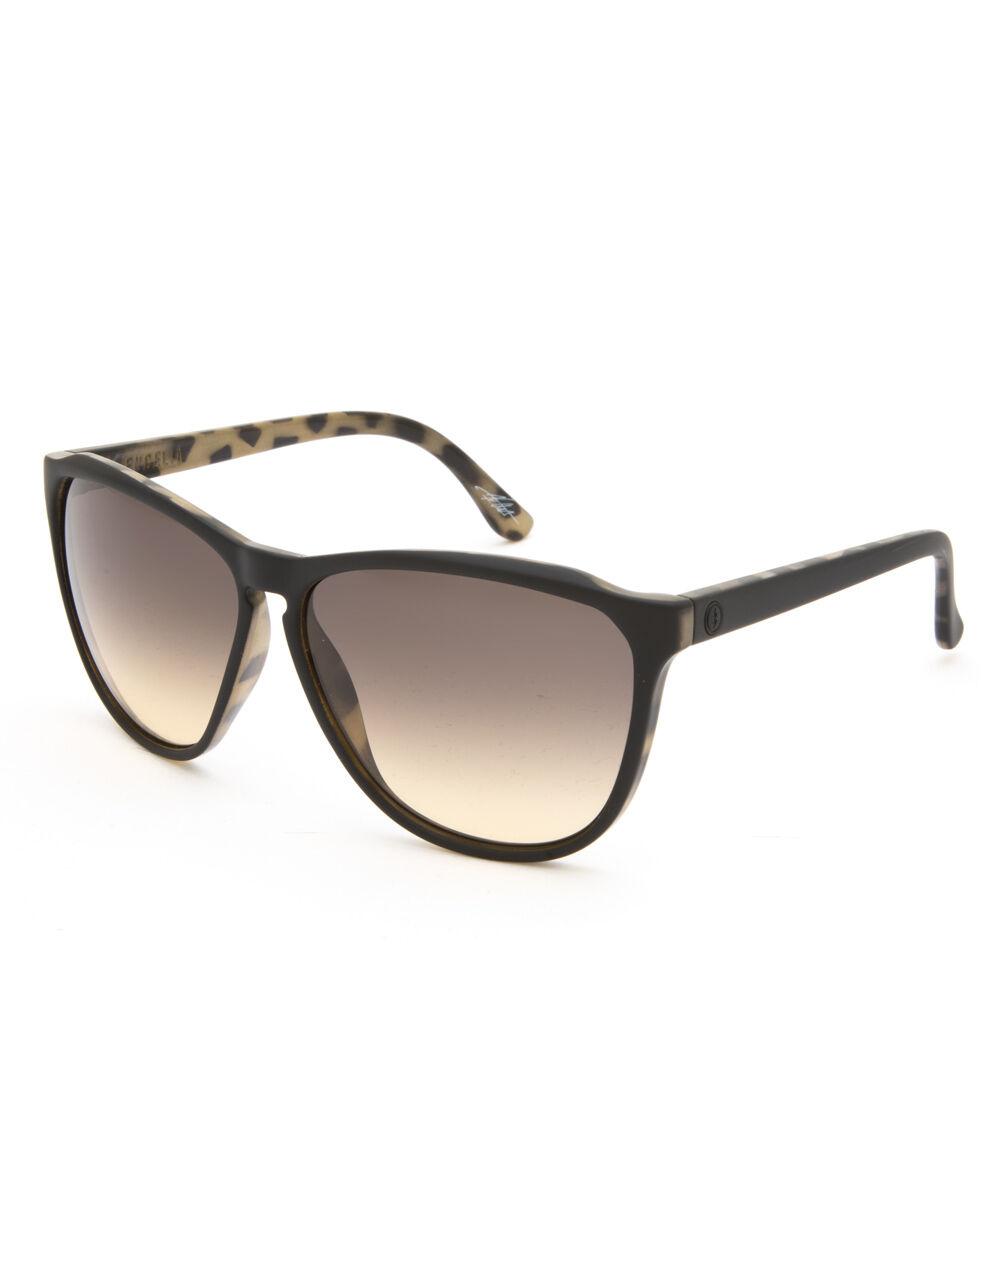 ELECTRIC Encelia Black Tortoise & Ohm Black Gradient Sunglasses